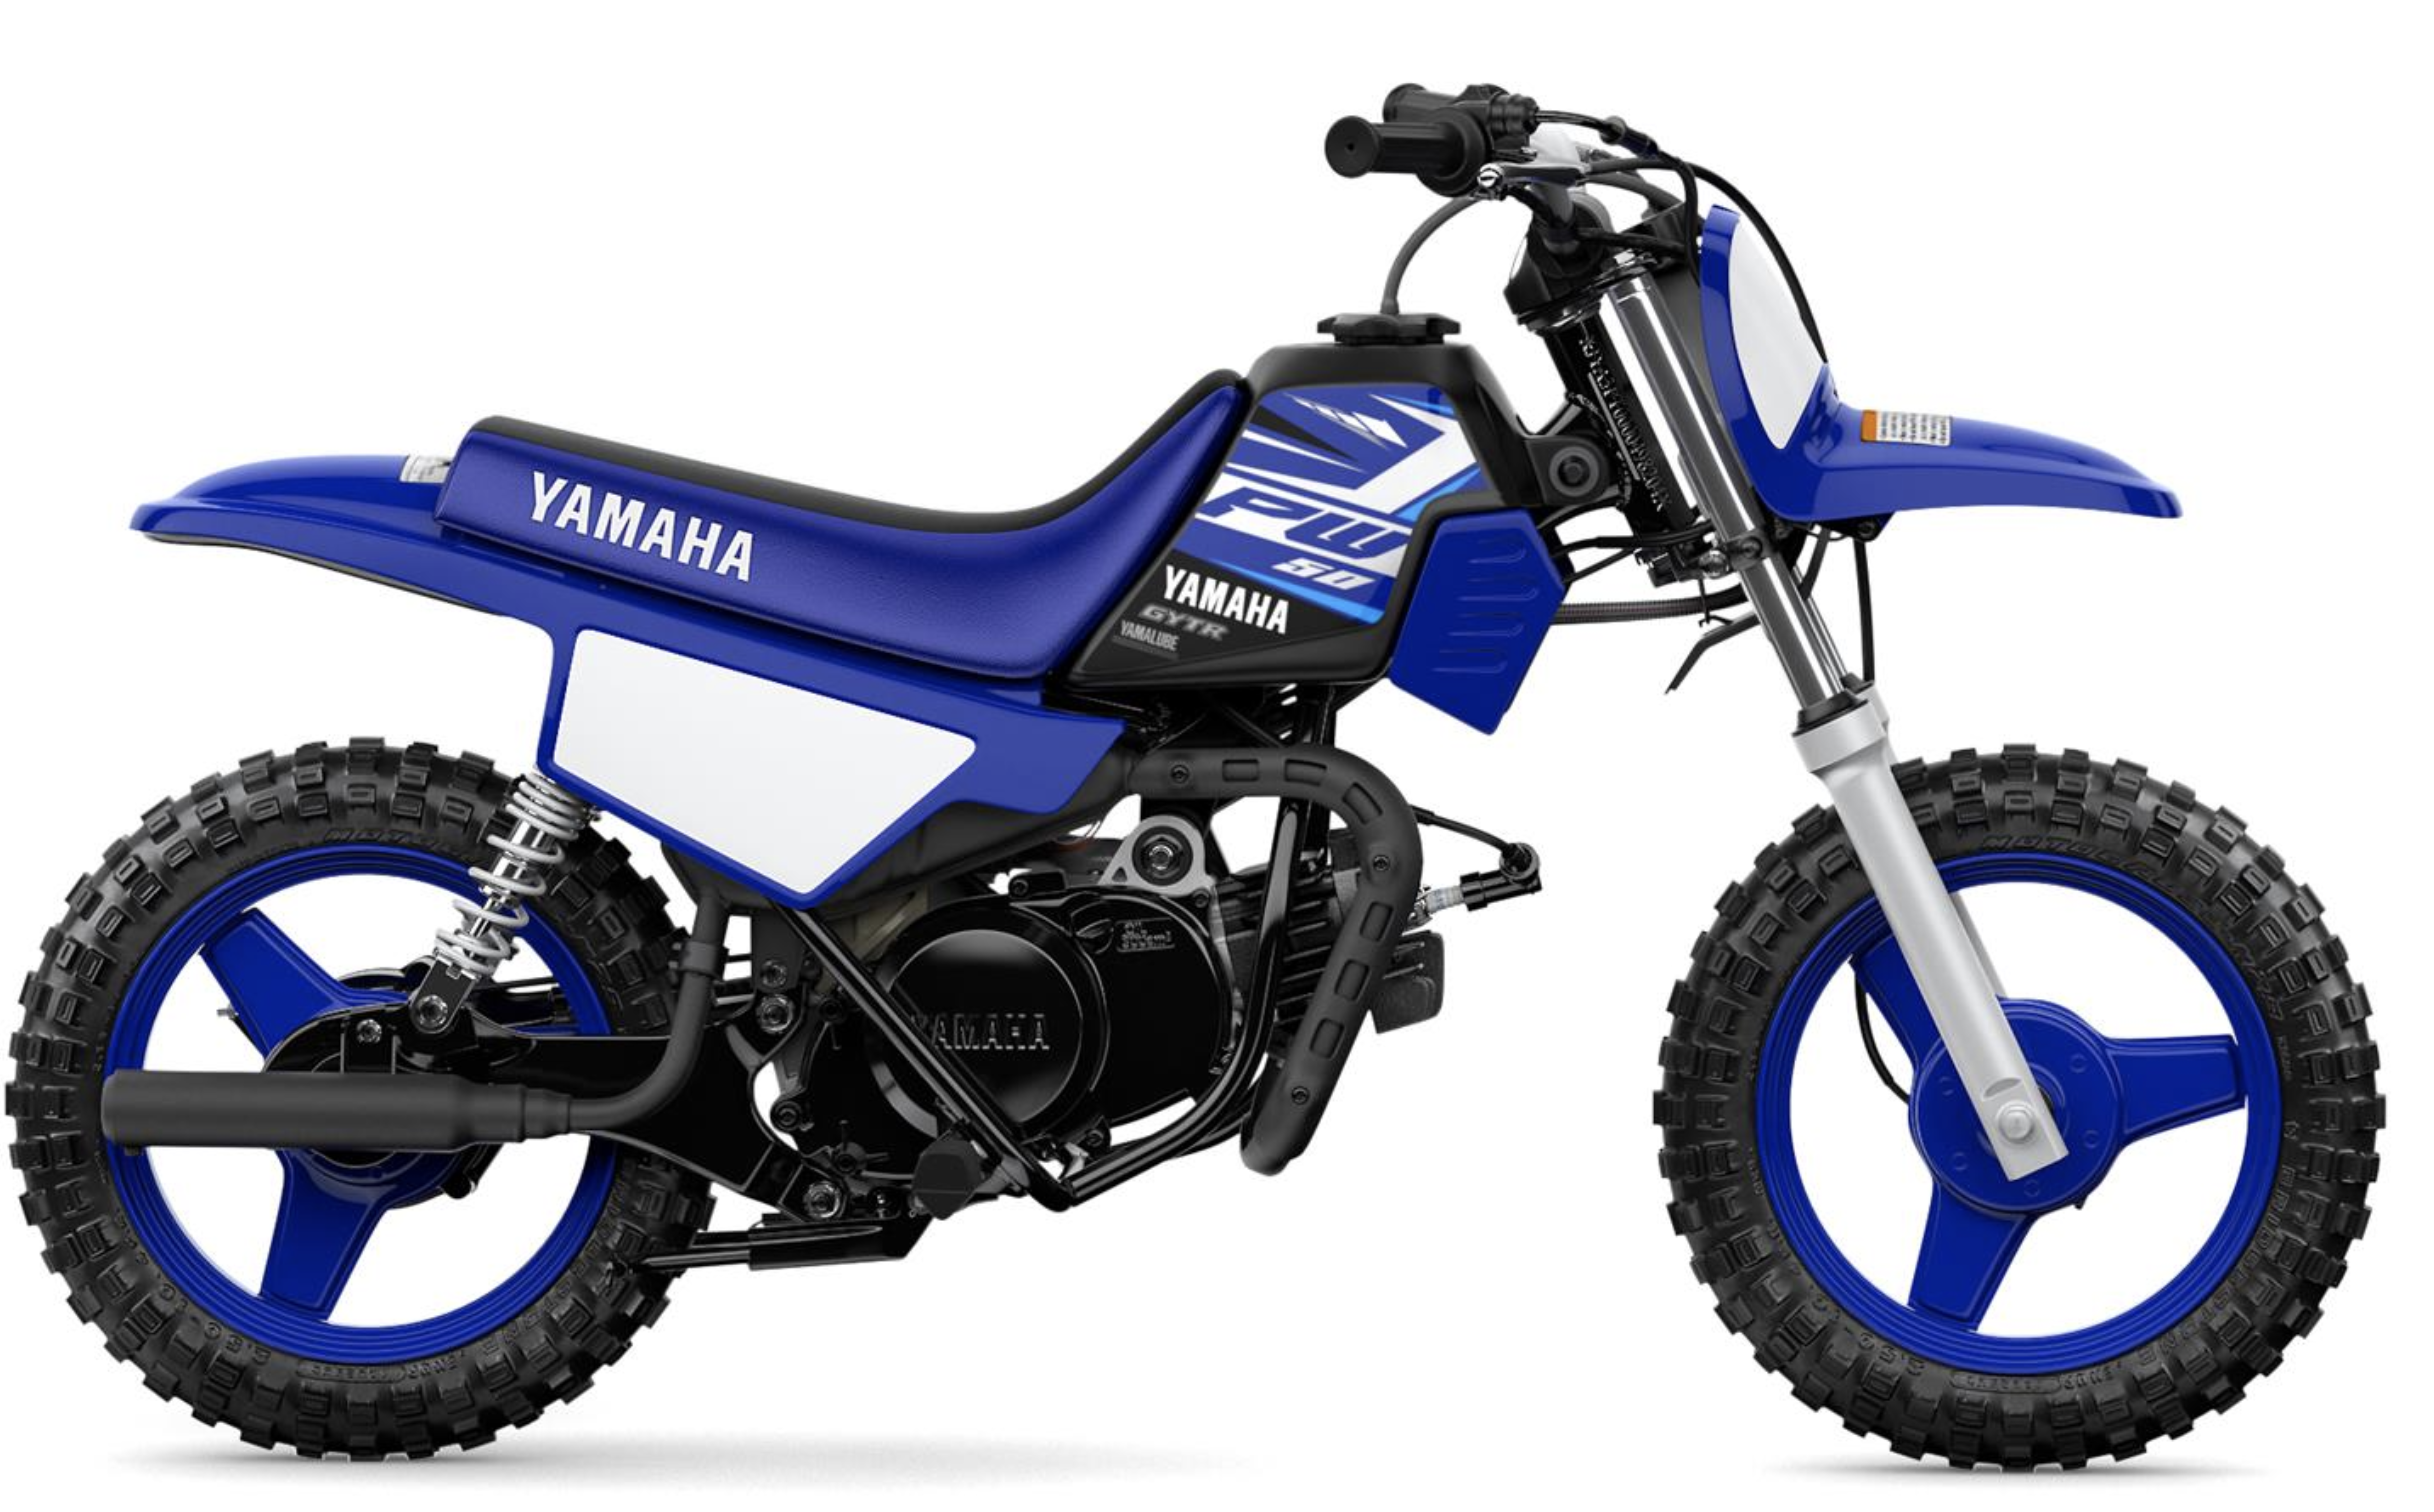 Yamaha PW50, the smallest kids dirt bike